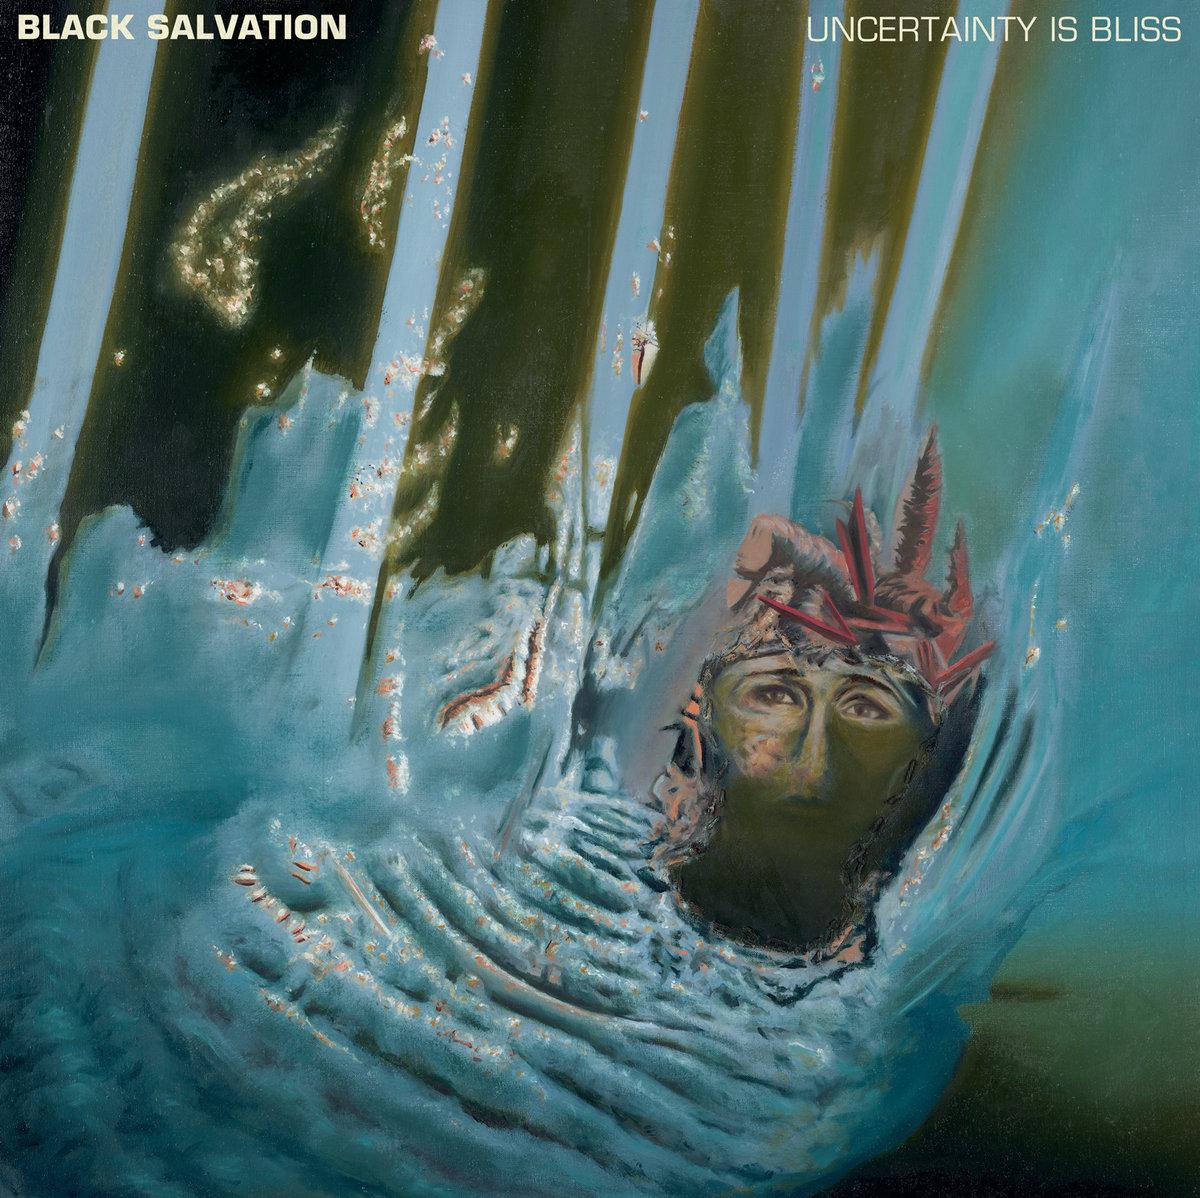 Resultado de imagen de black salvation uncertainty is bliss